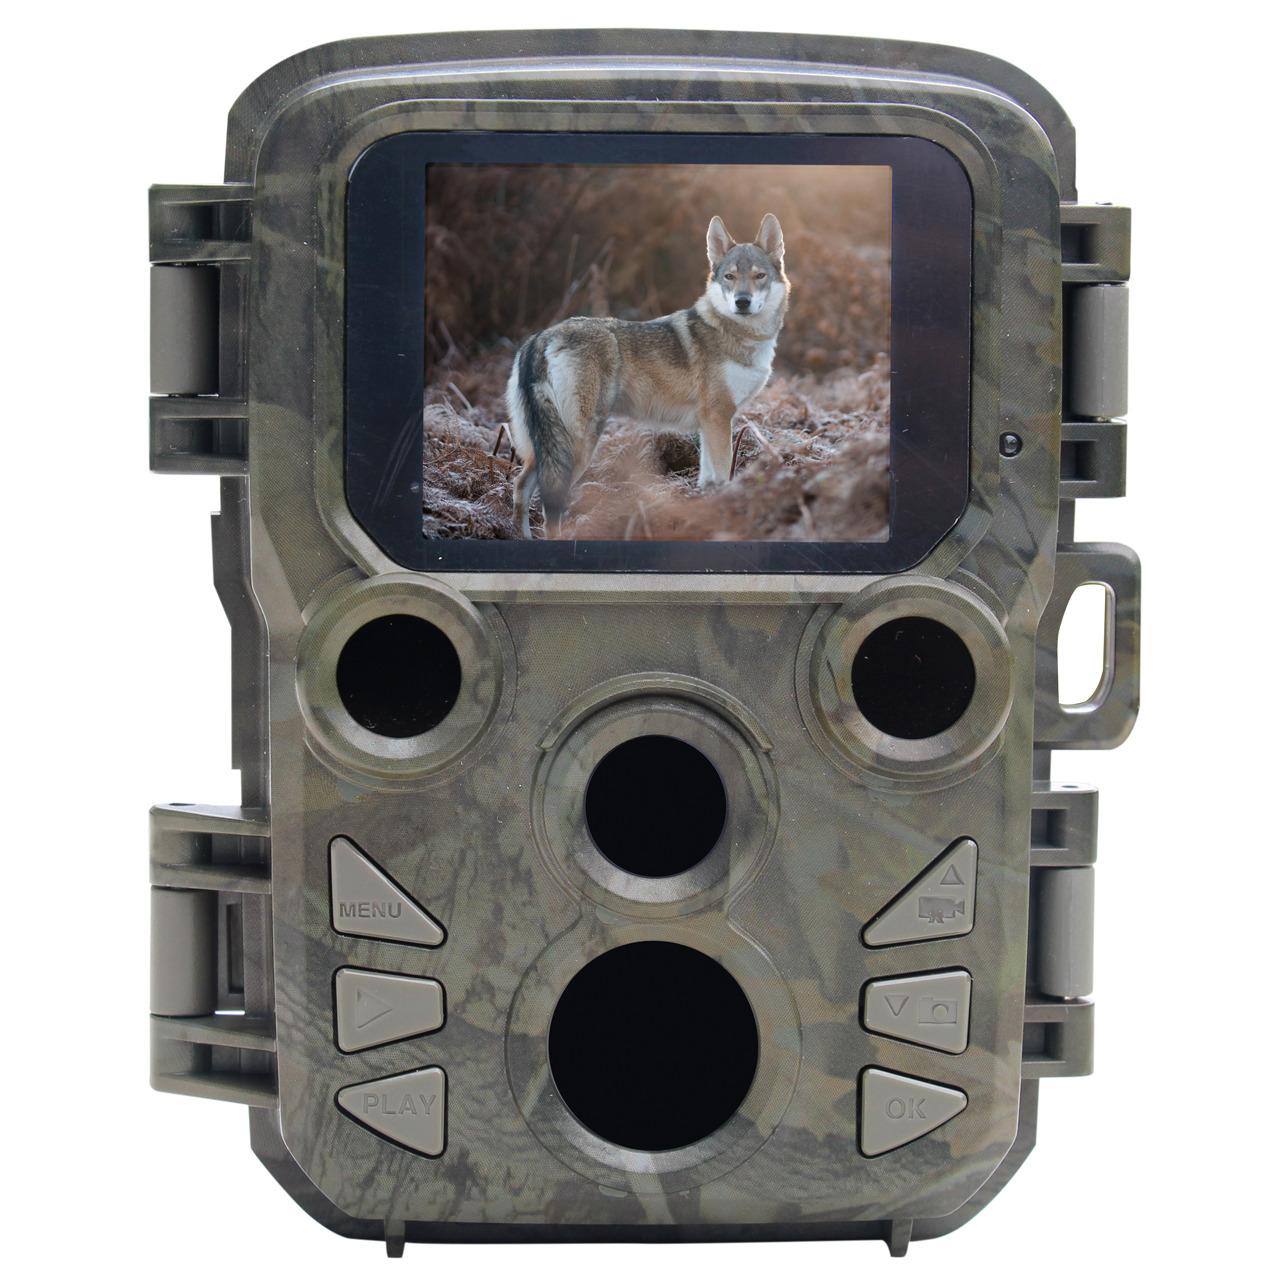 Braun Mini-Fotofalle - Wildkamera Scouting Cam BLACK500 Mini- 16 MP- 1080p- IP56- Auslösezeit 0-45s